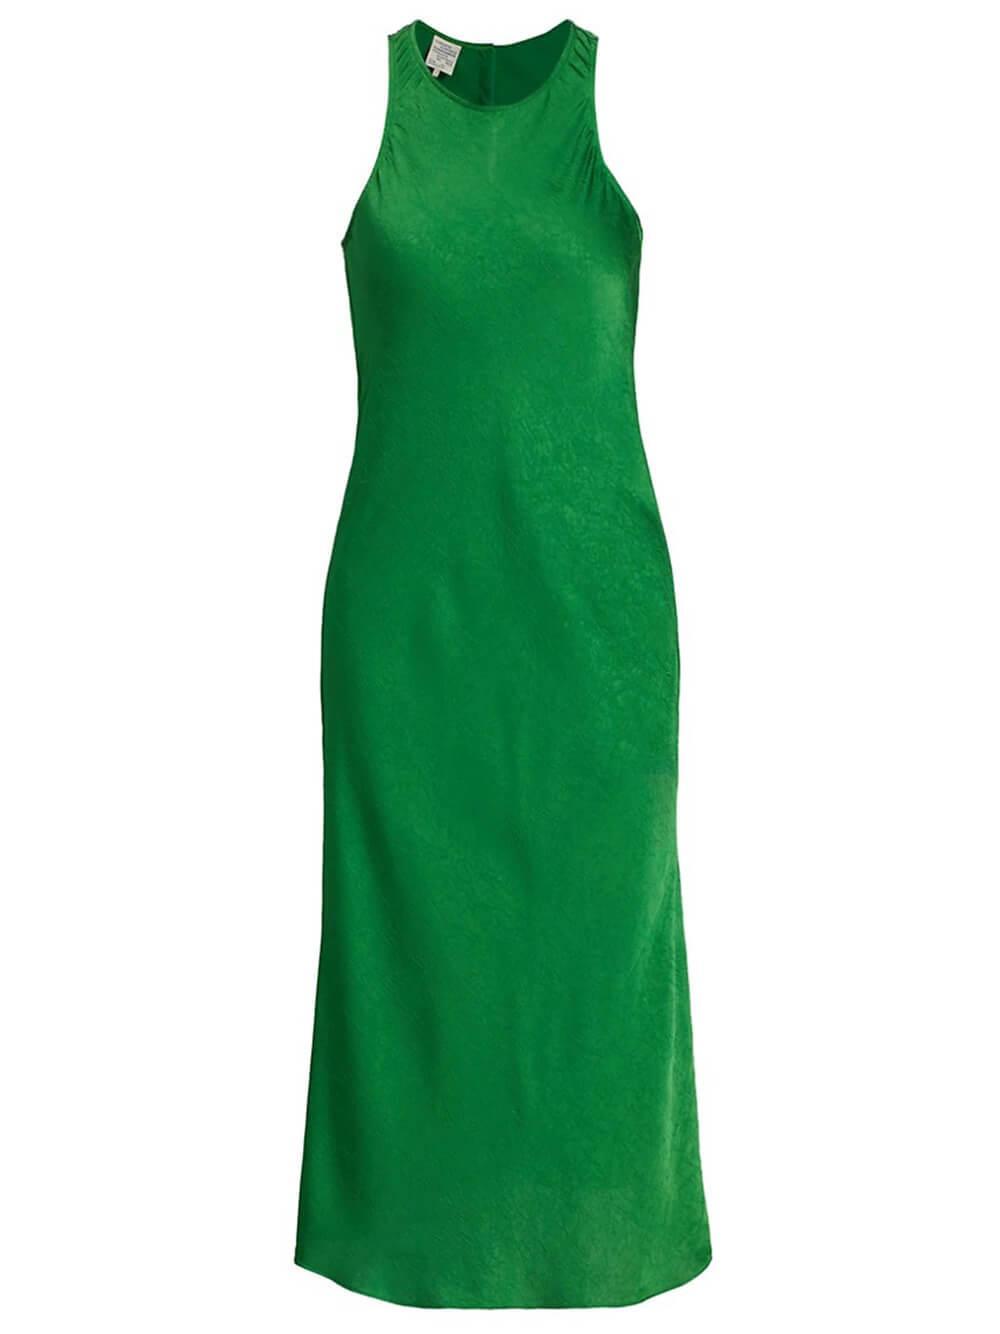 Antoya Slip Dress